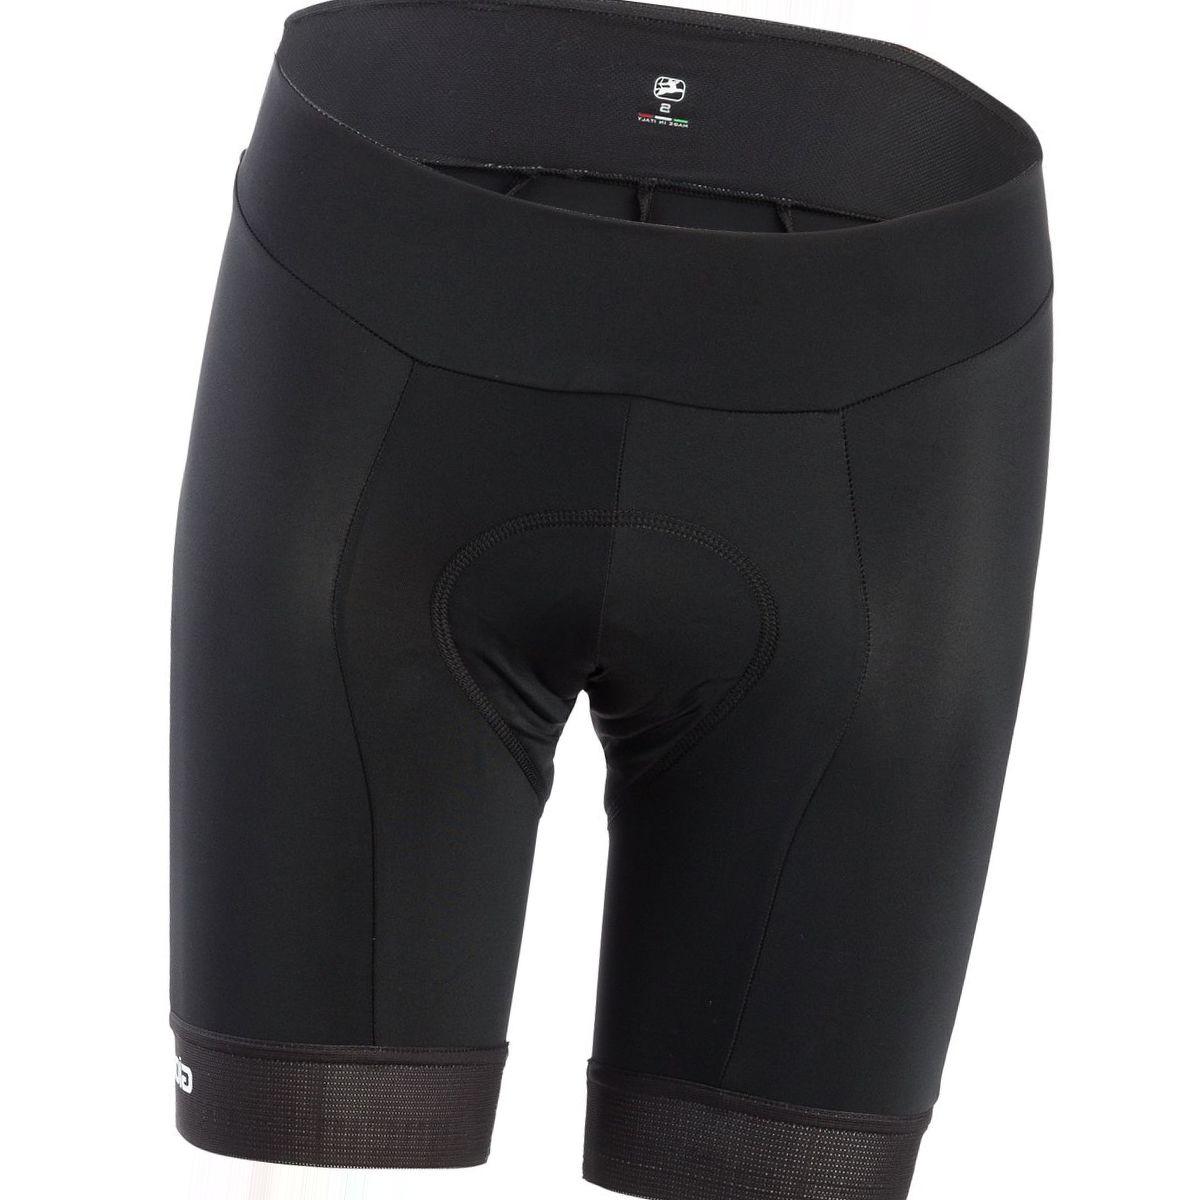 Giordana Vero Pro Short - Women's